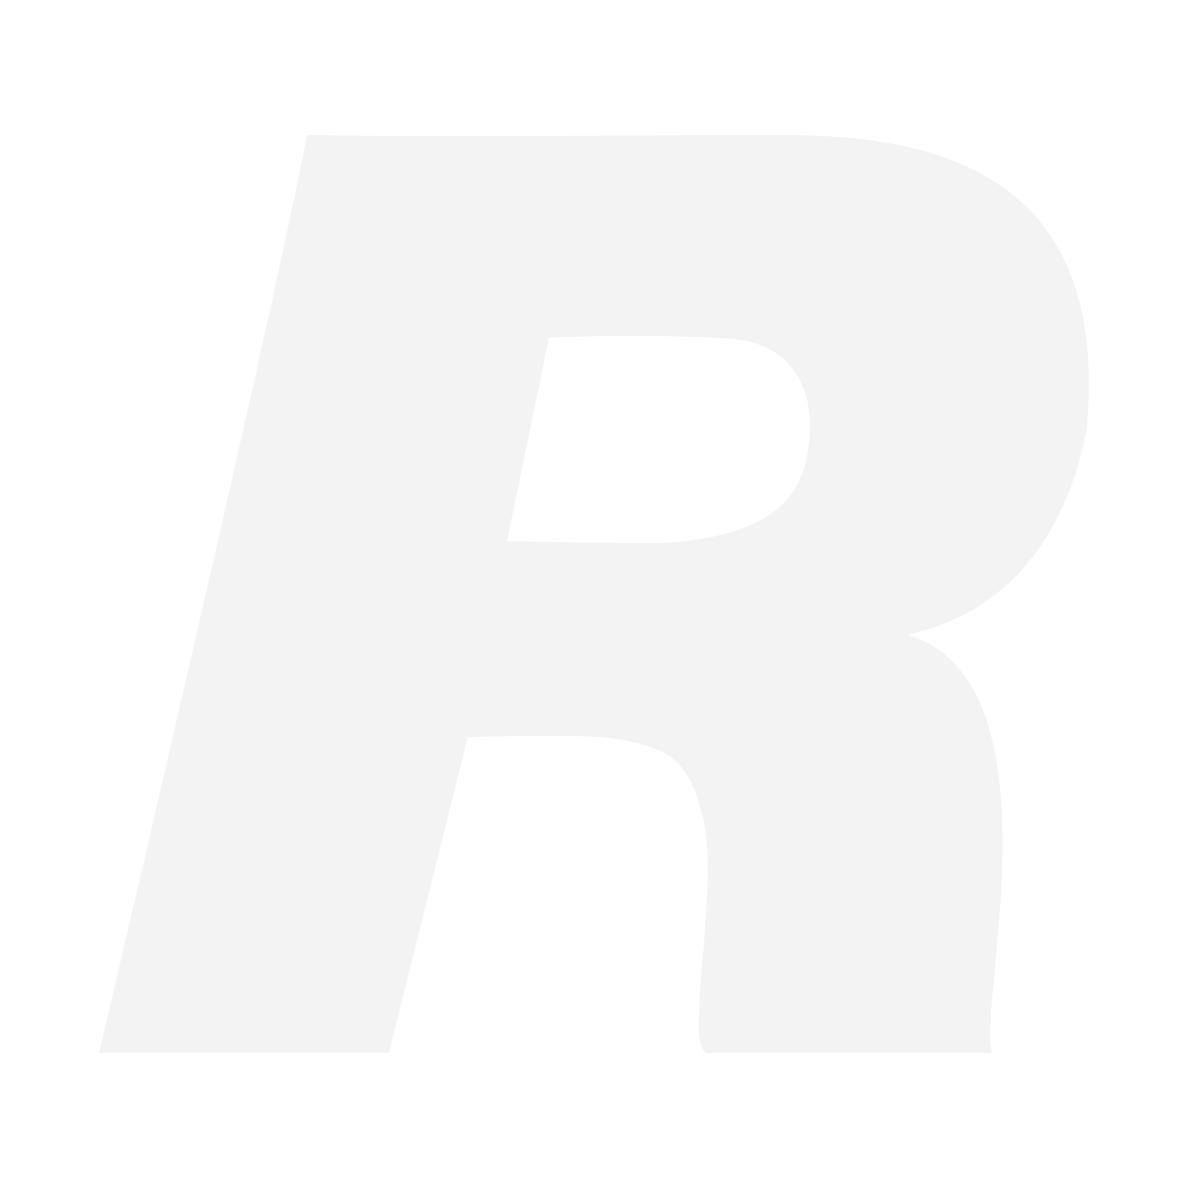 OLYMPUS MF-1 ADAPTERI (SIS. ALV 24%) KÄYTETTY